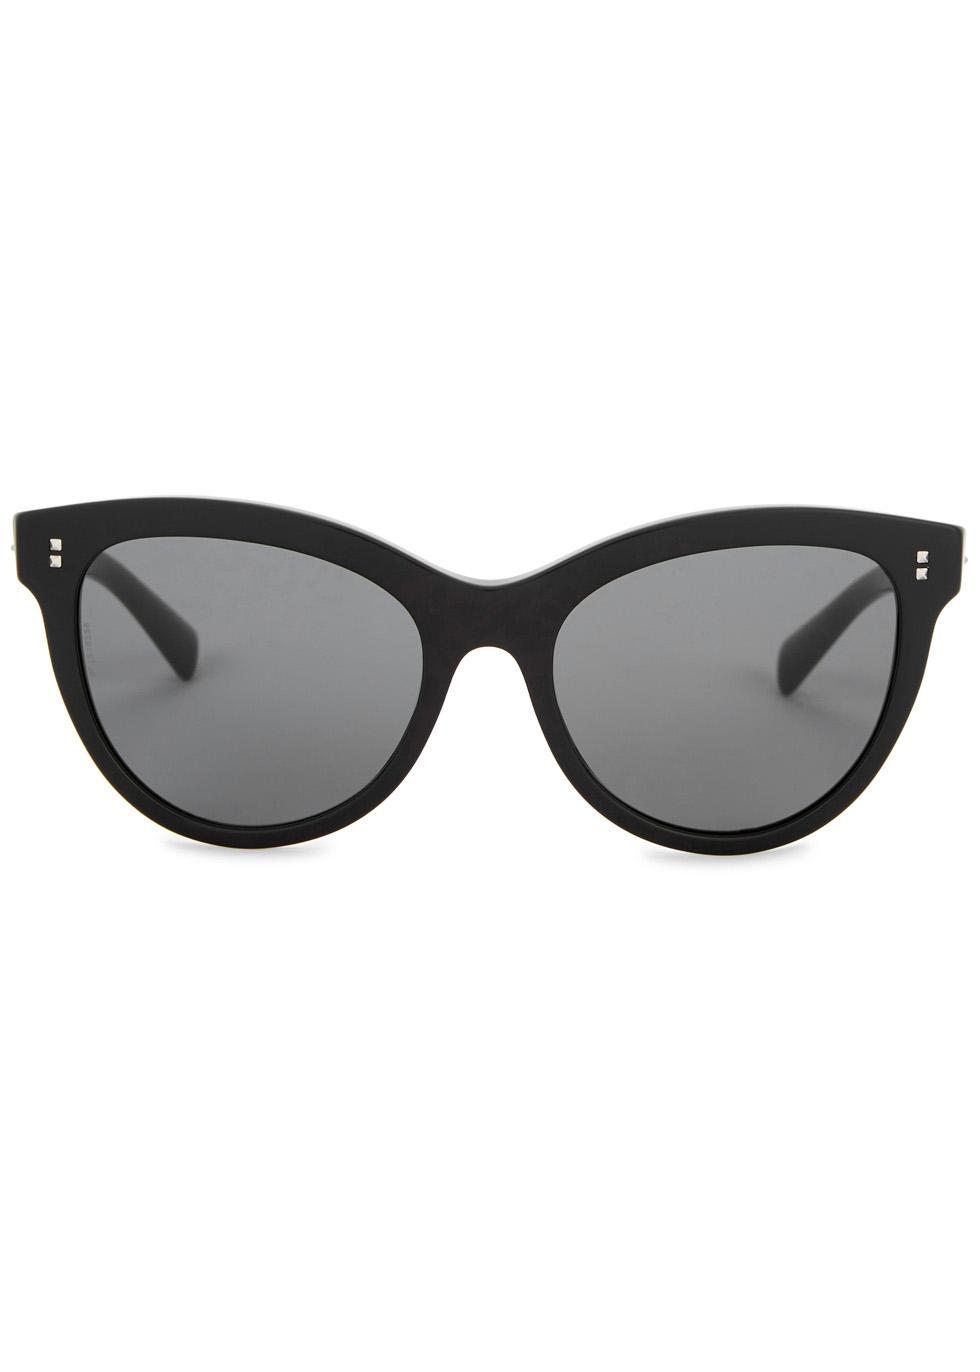 Black cat-eye sunglasses - Valentino Garavani